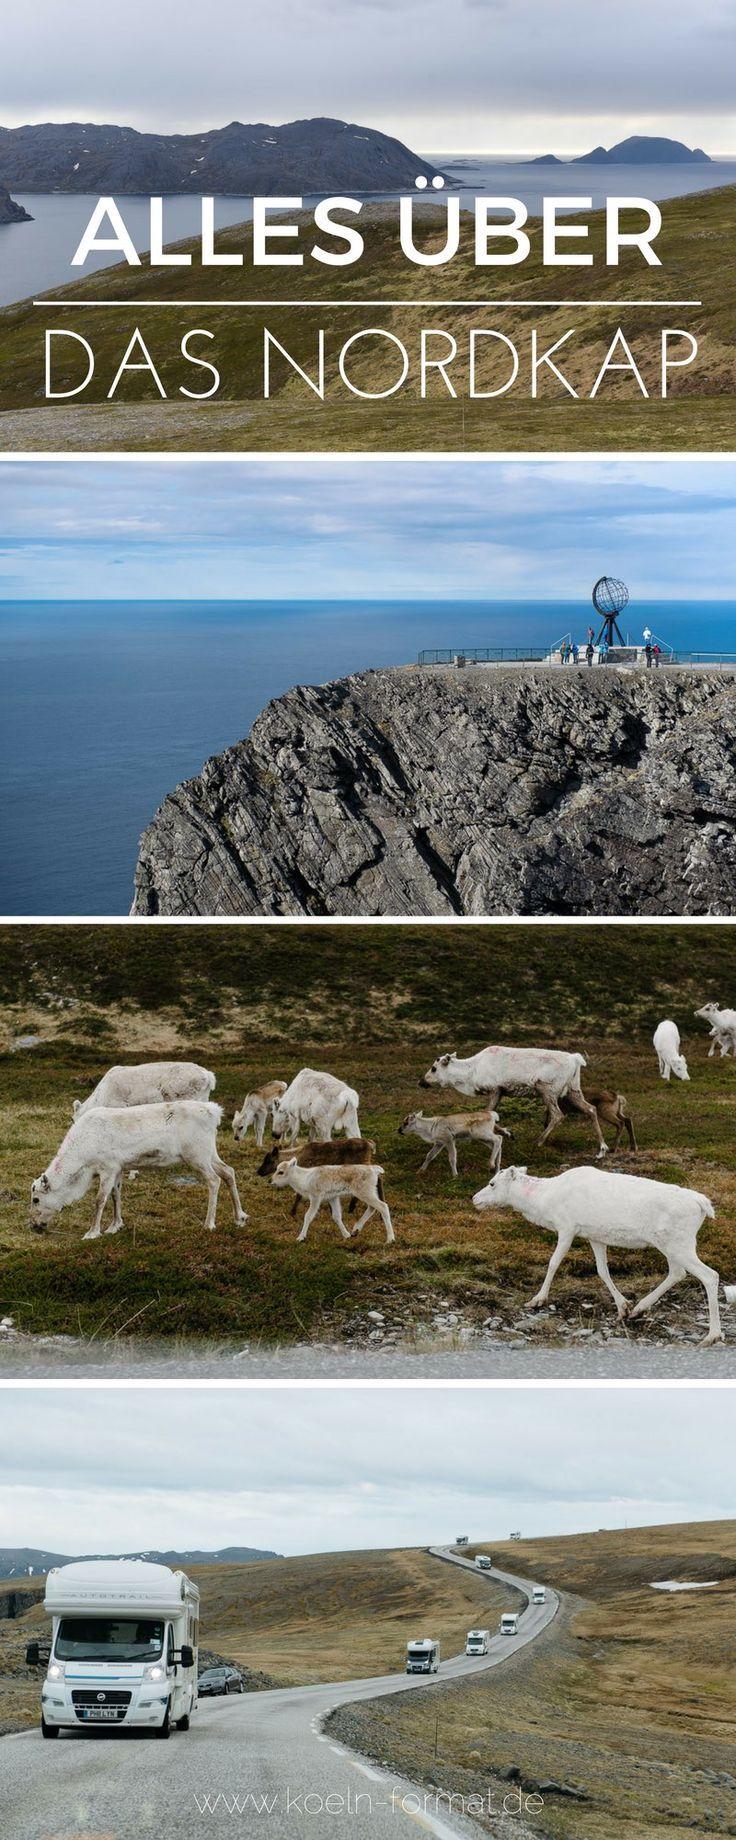 Mit dem Auto zum Nordkap – ein Nordkap Reisebericht